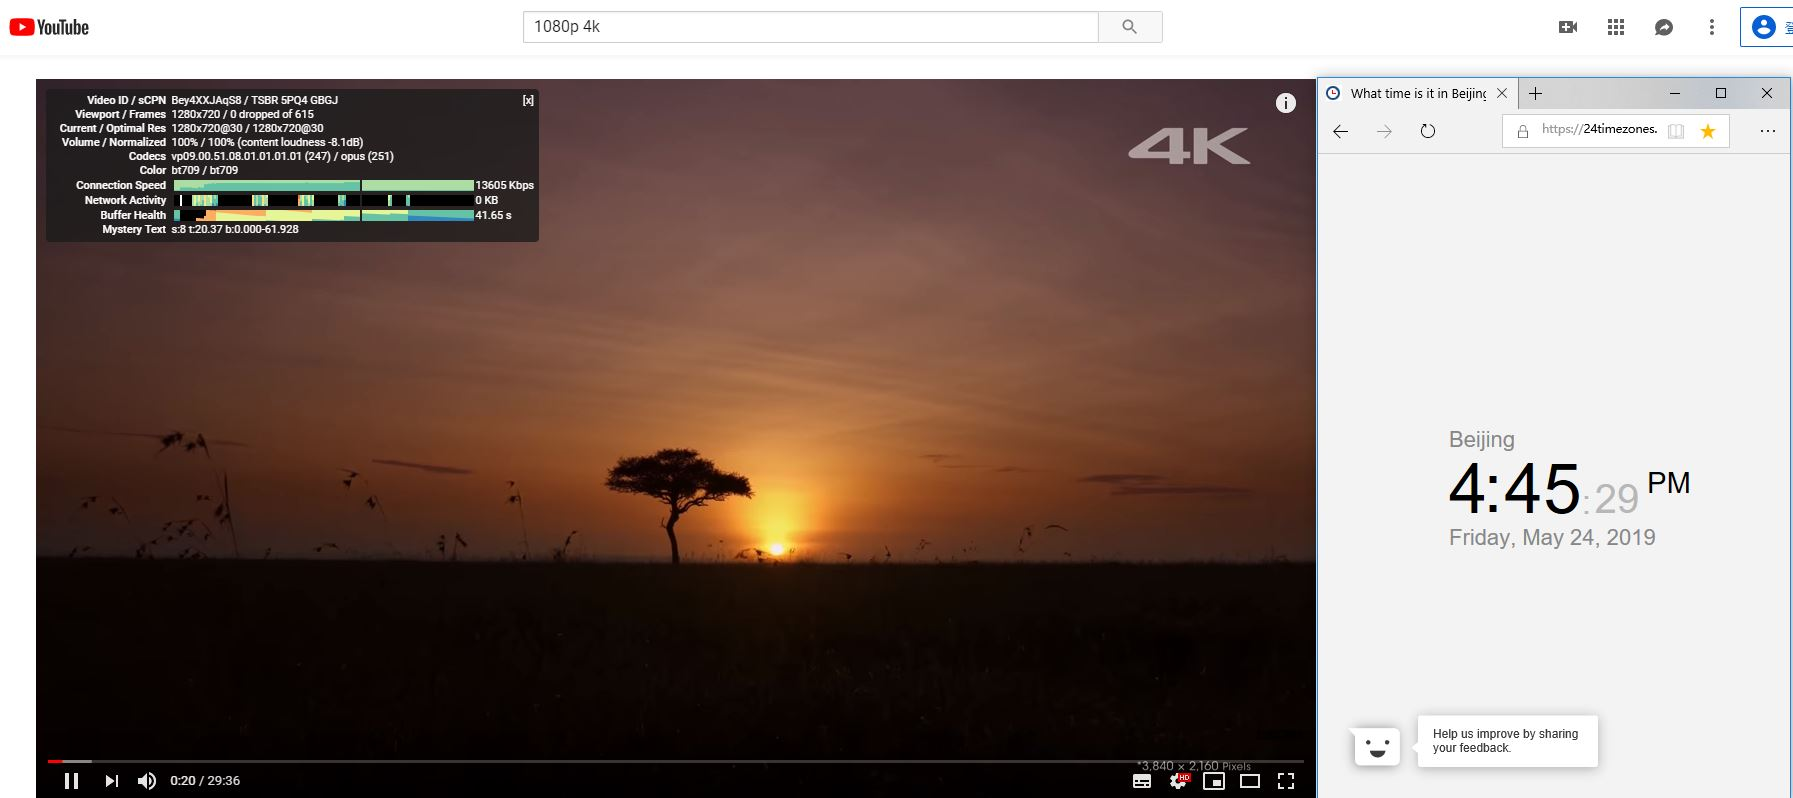 ExpressVPN windows japan-tokyo-1节点 翻墙成功-youtube-20190524